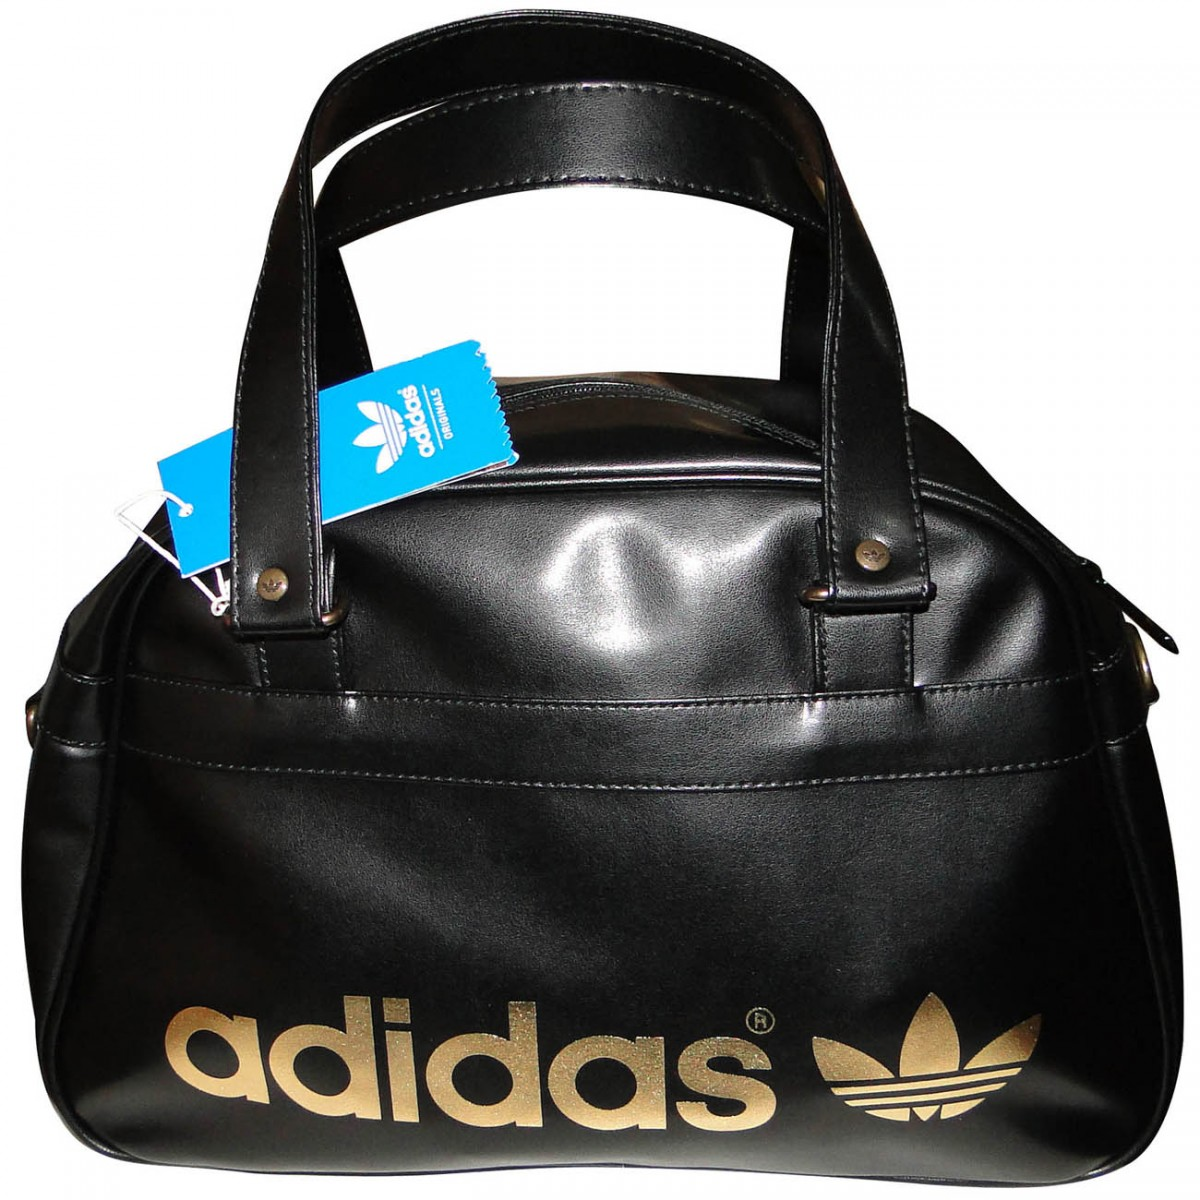 Bolsa Bowling Adicolor Adidas Adidas Adicolor Bowling Bolsa Adidas Bolsa dtQrsh